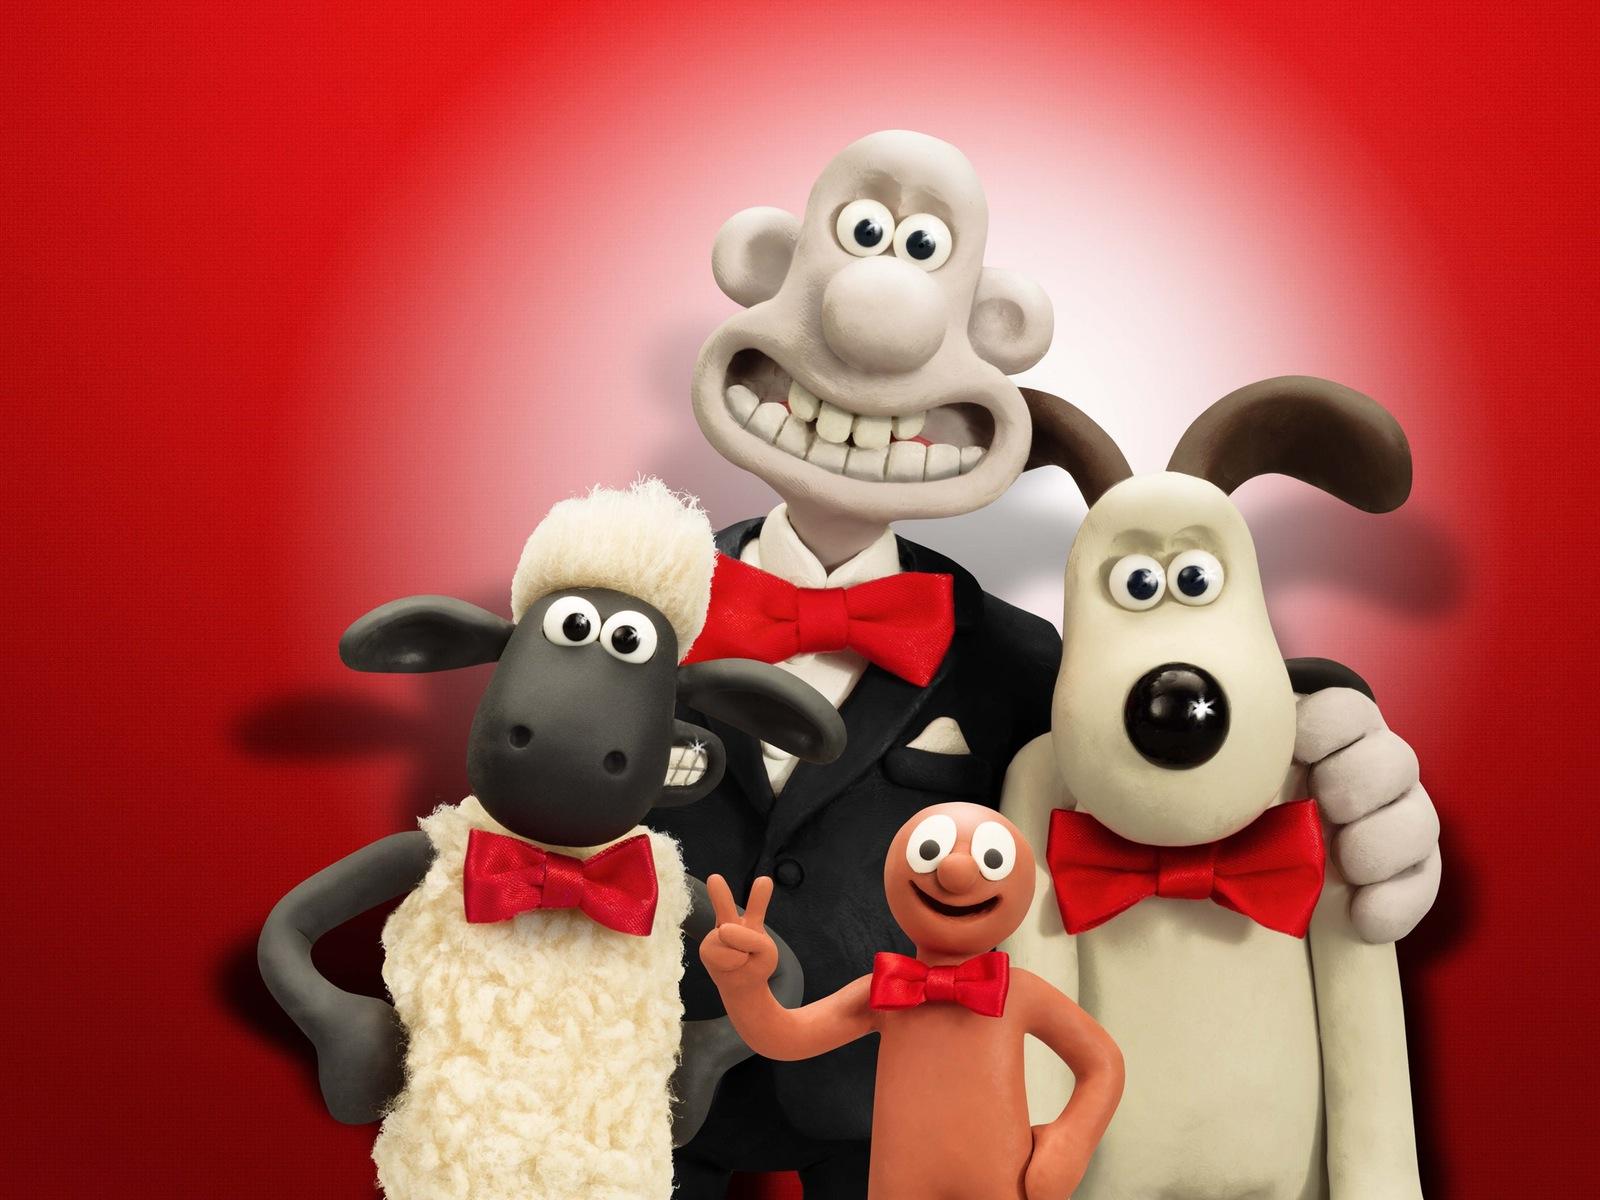 Wallace & Gromit and friends, Melbourne, Victoria, Australia